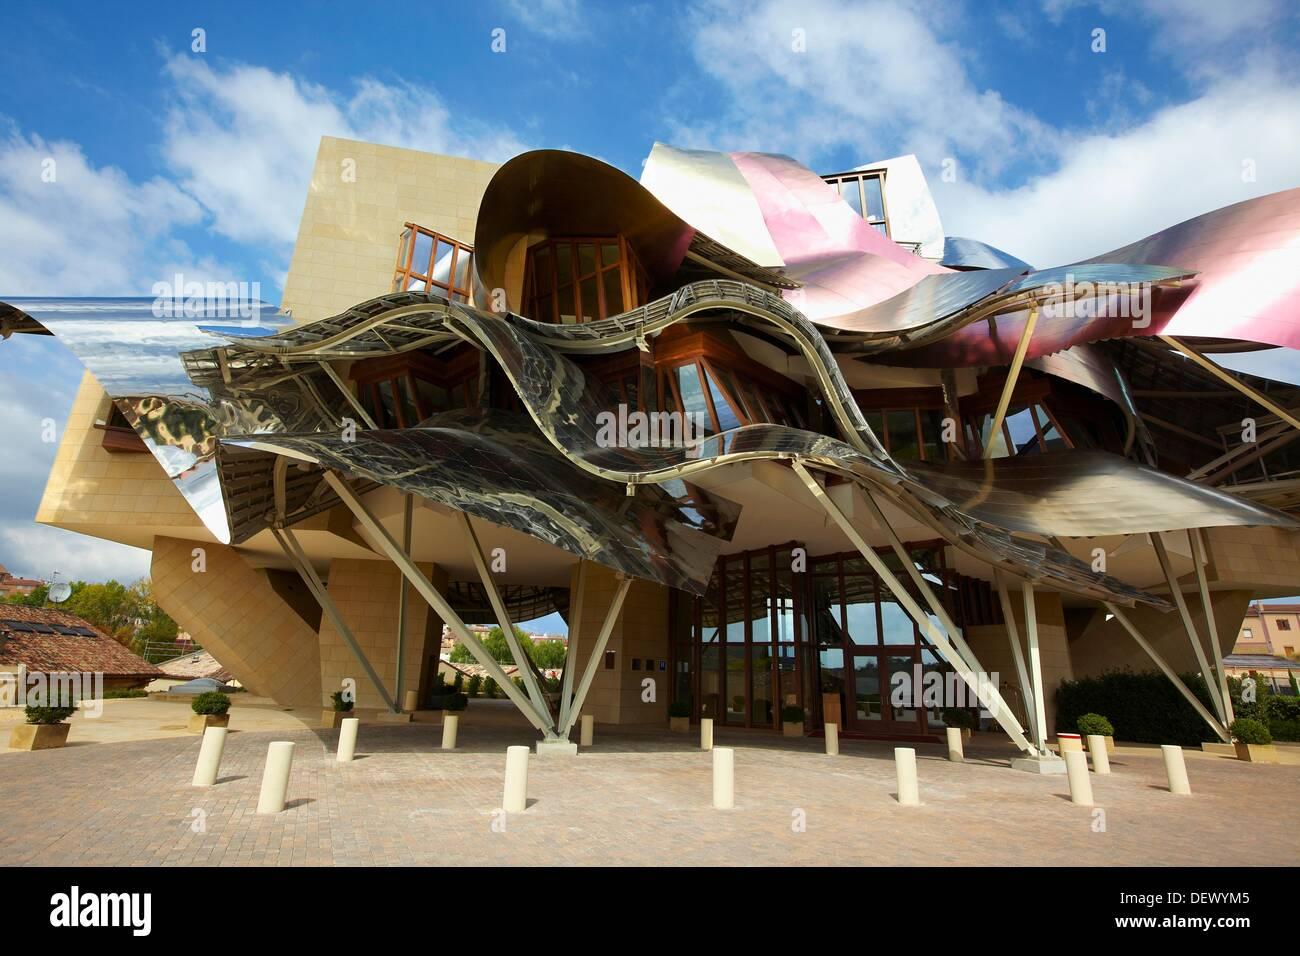 Hotel Designed By Frank Gehry Bodegas Marques De Riscal Elciego